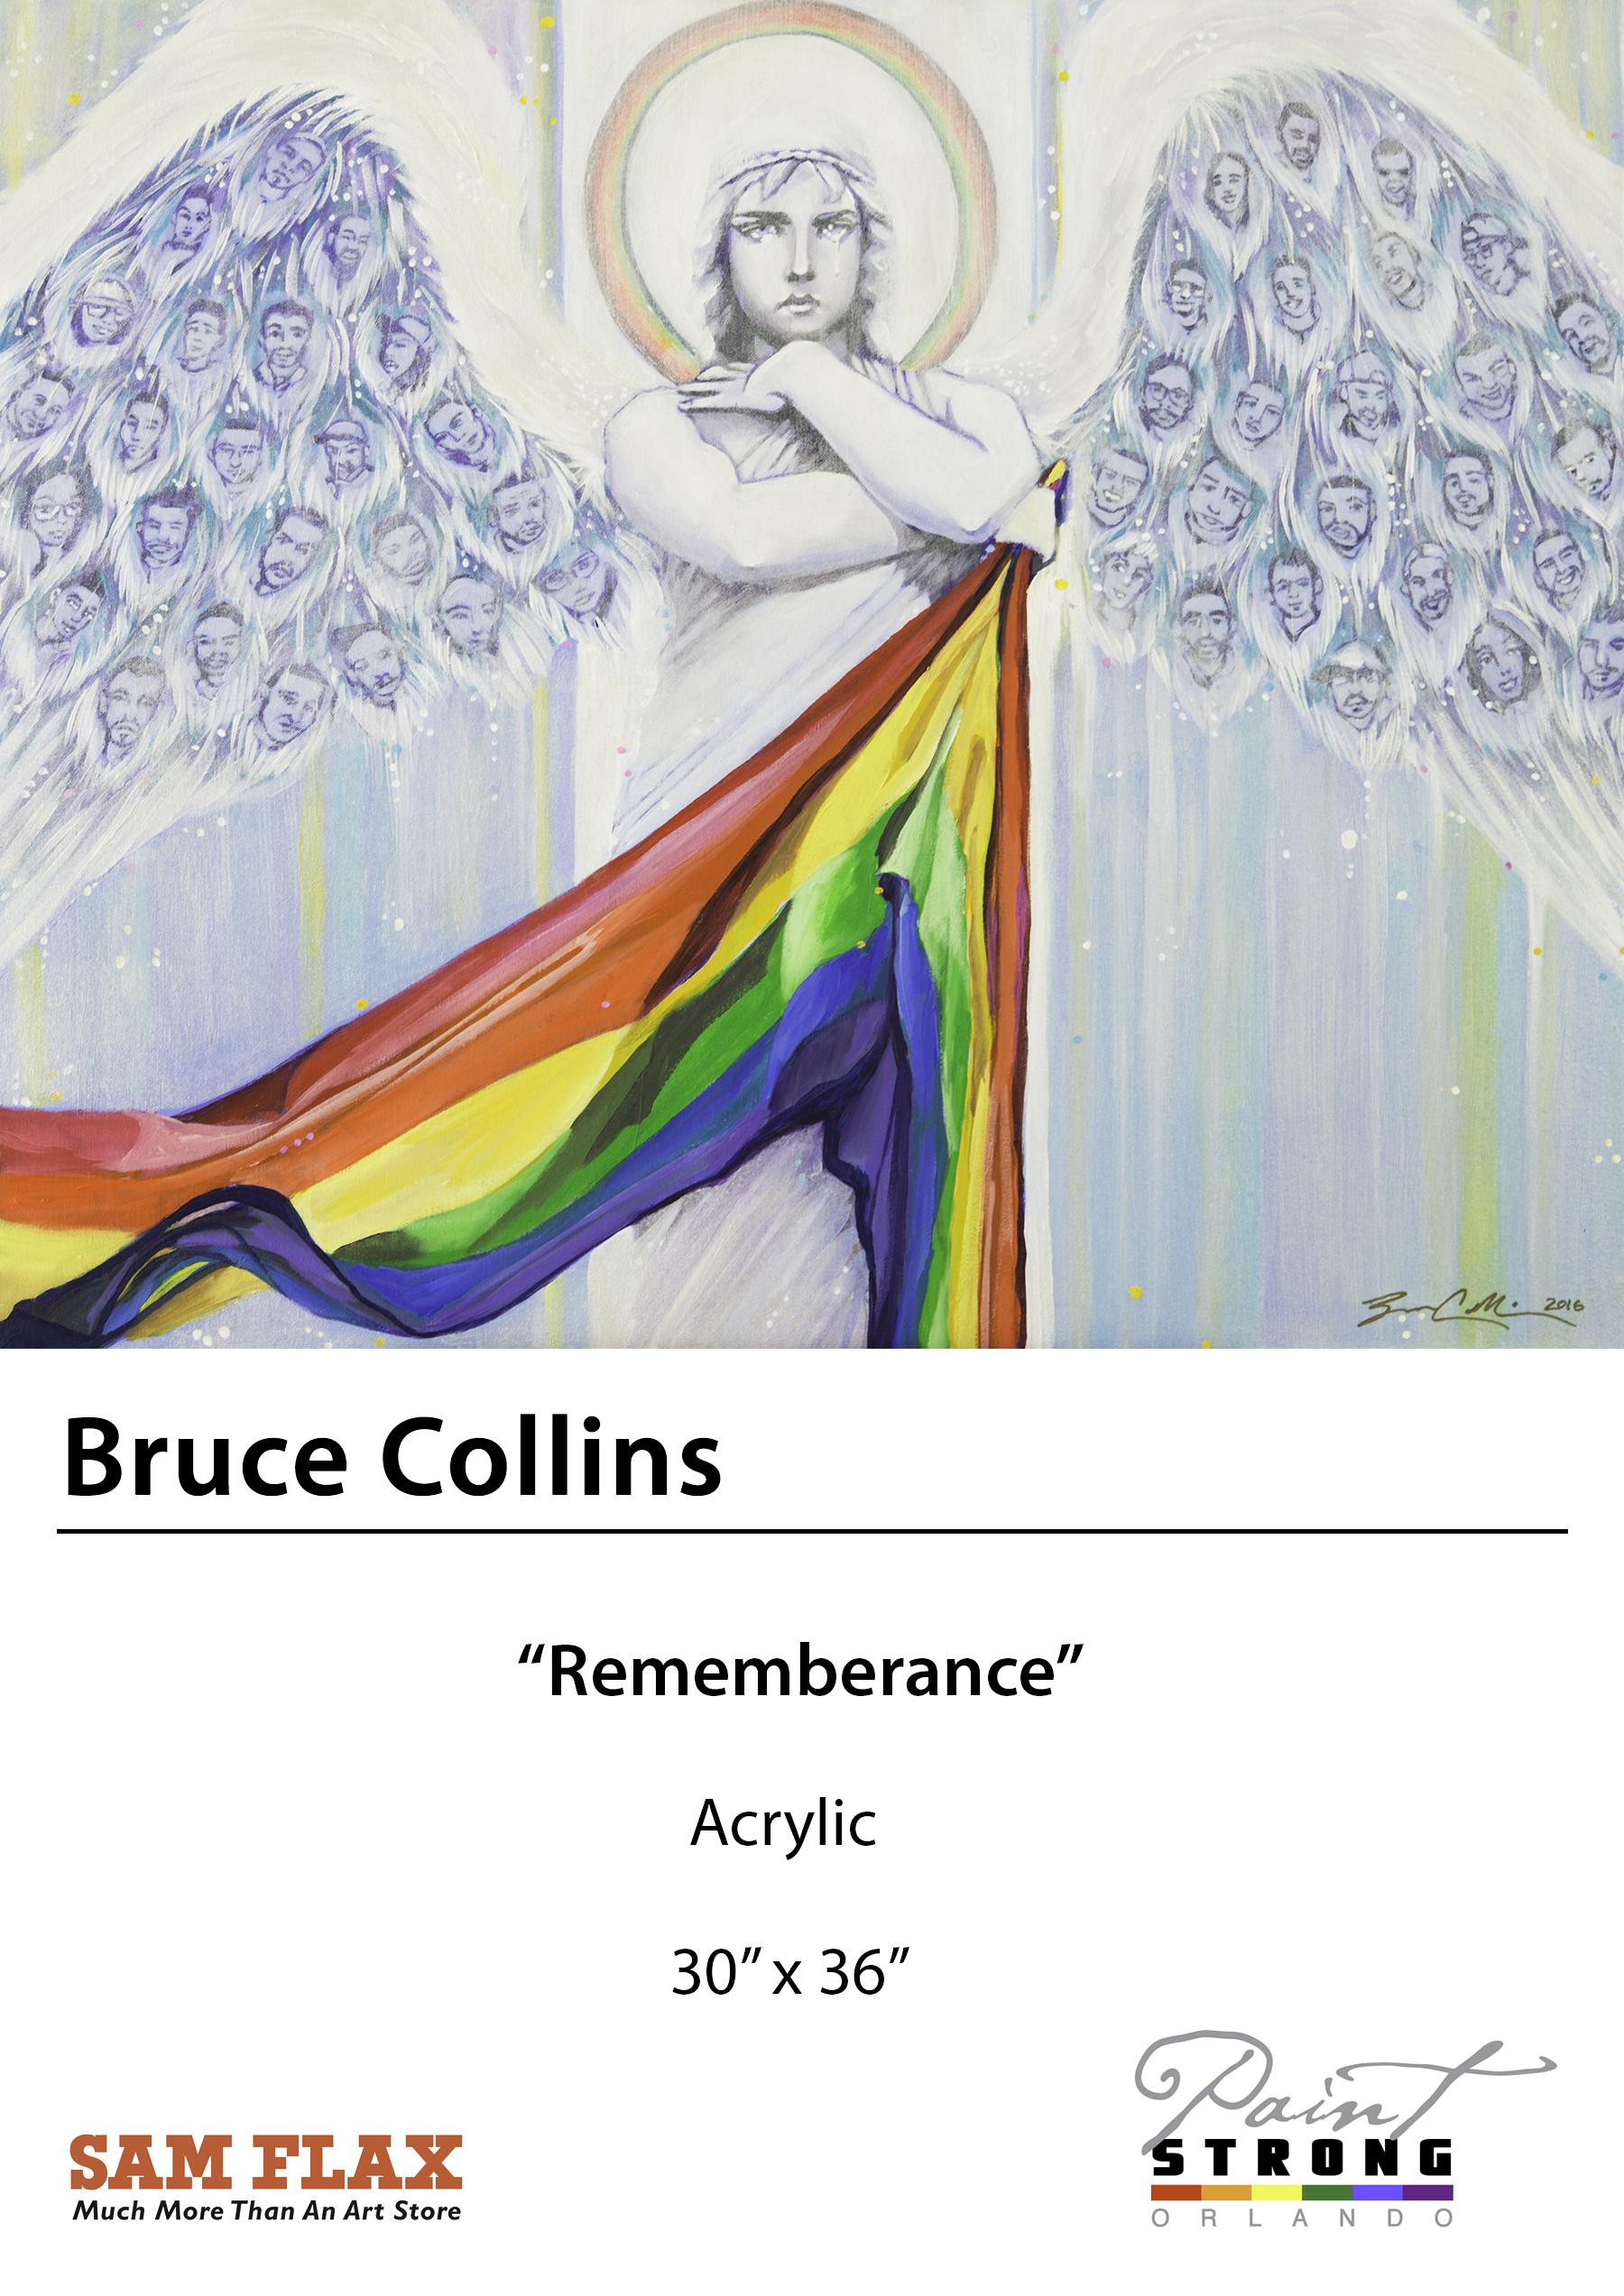 Bruce Collins